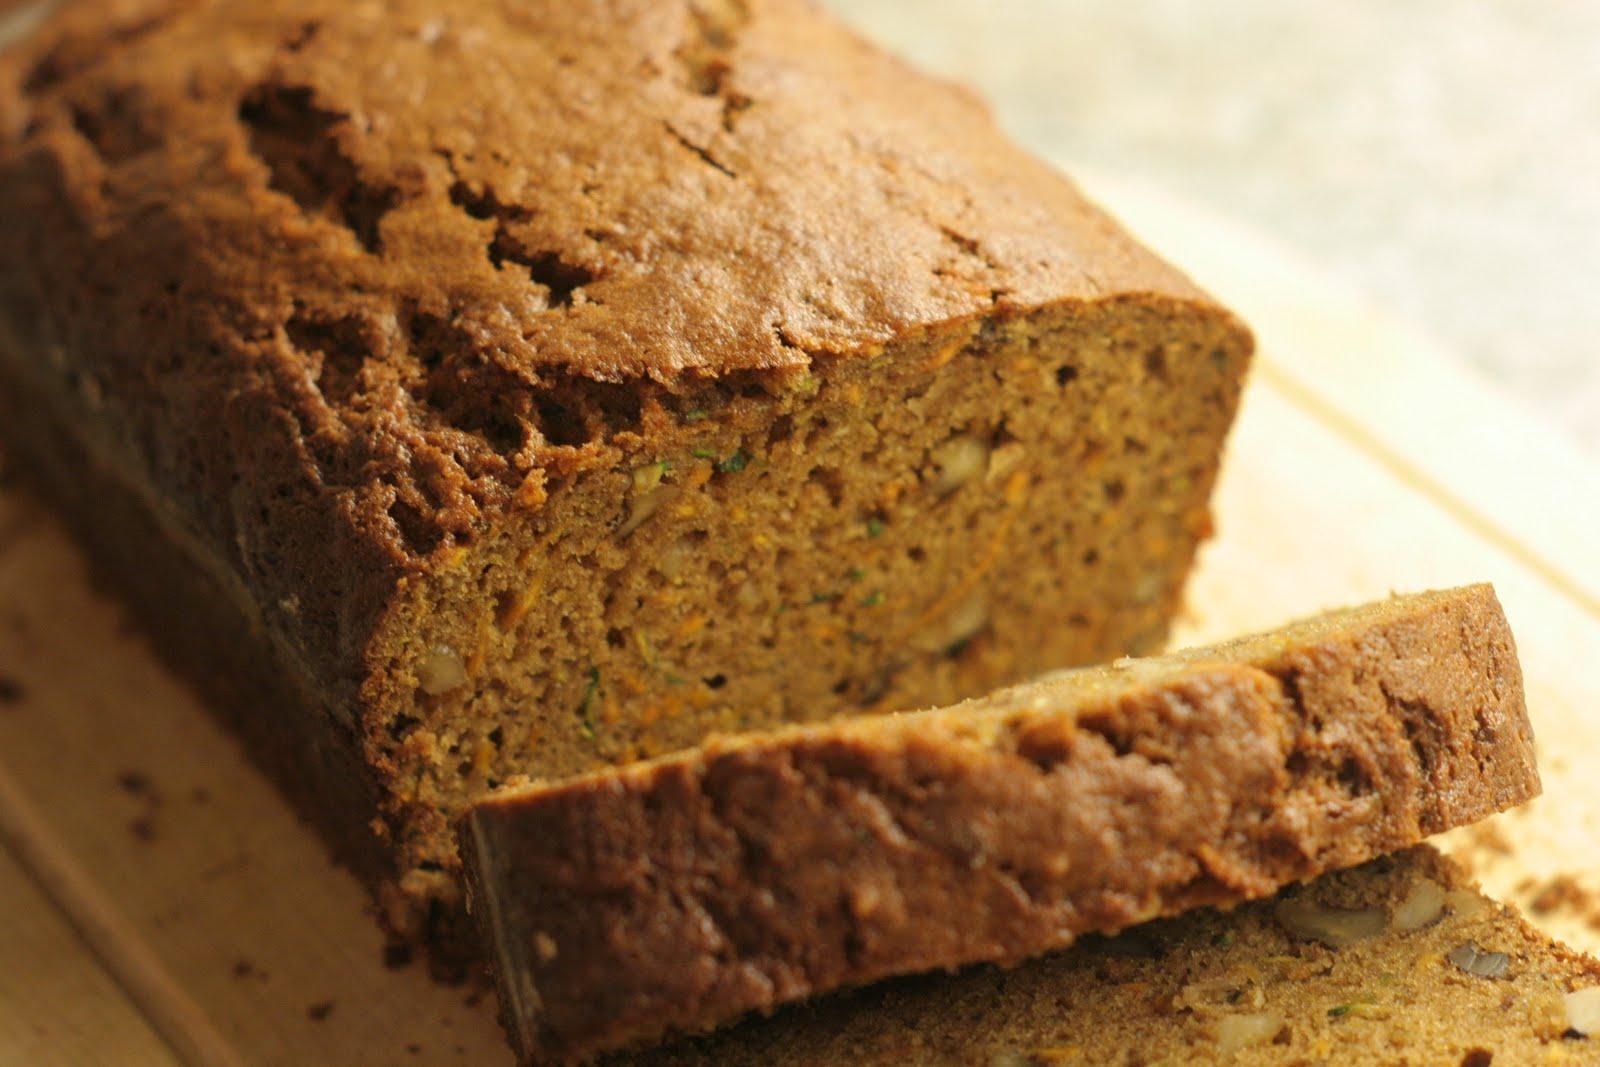 Four seasons of food: Zucchini sweet potato bread